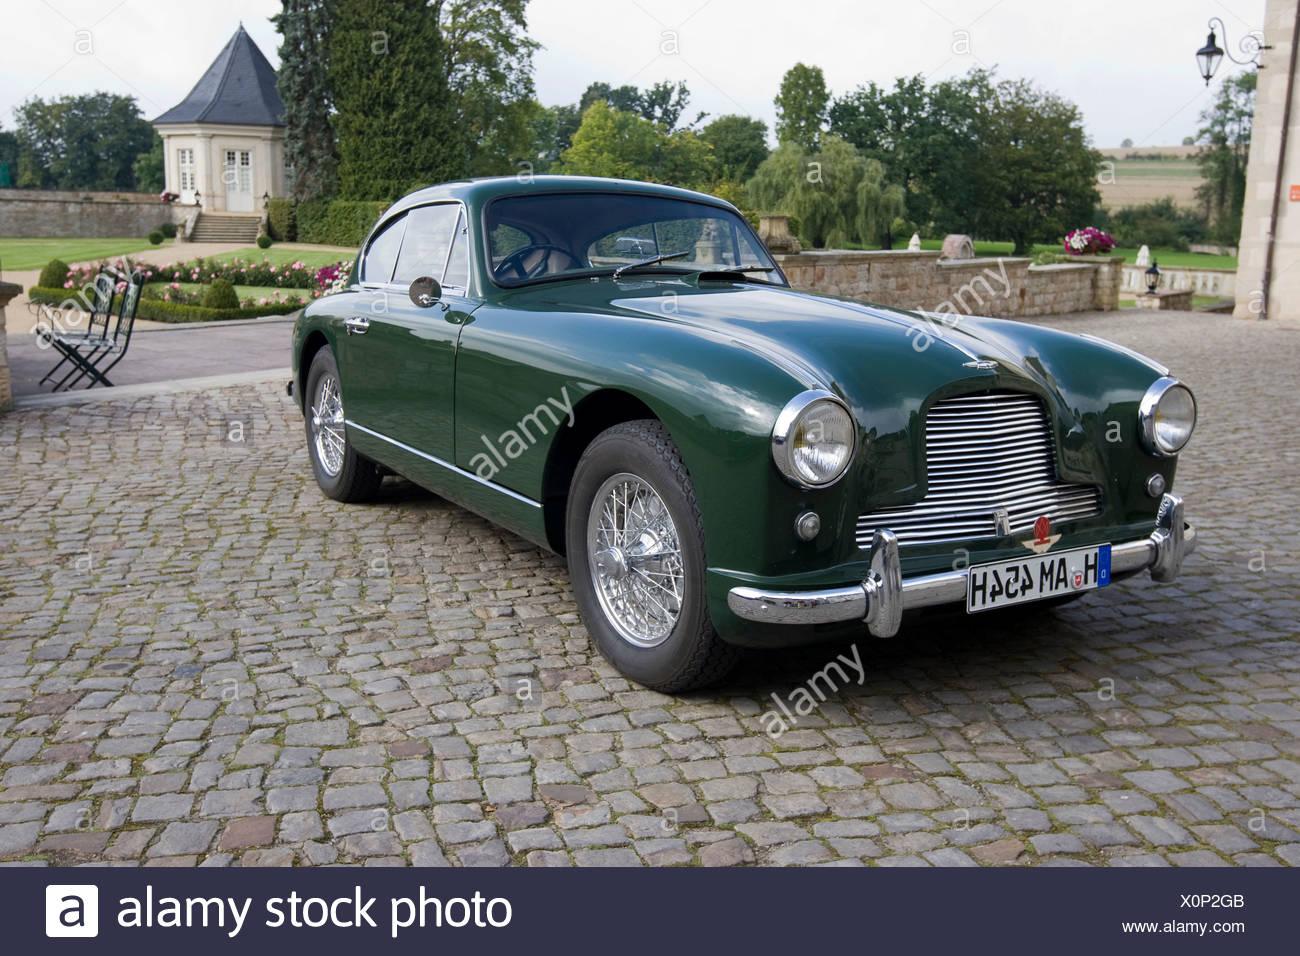 Aston Martin DB 2/4 Mark II, Aston Martin Meet, Lower Saxony, Germany, Europe - Stock Image